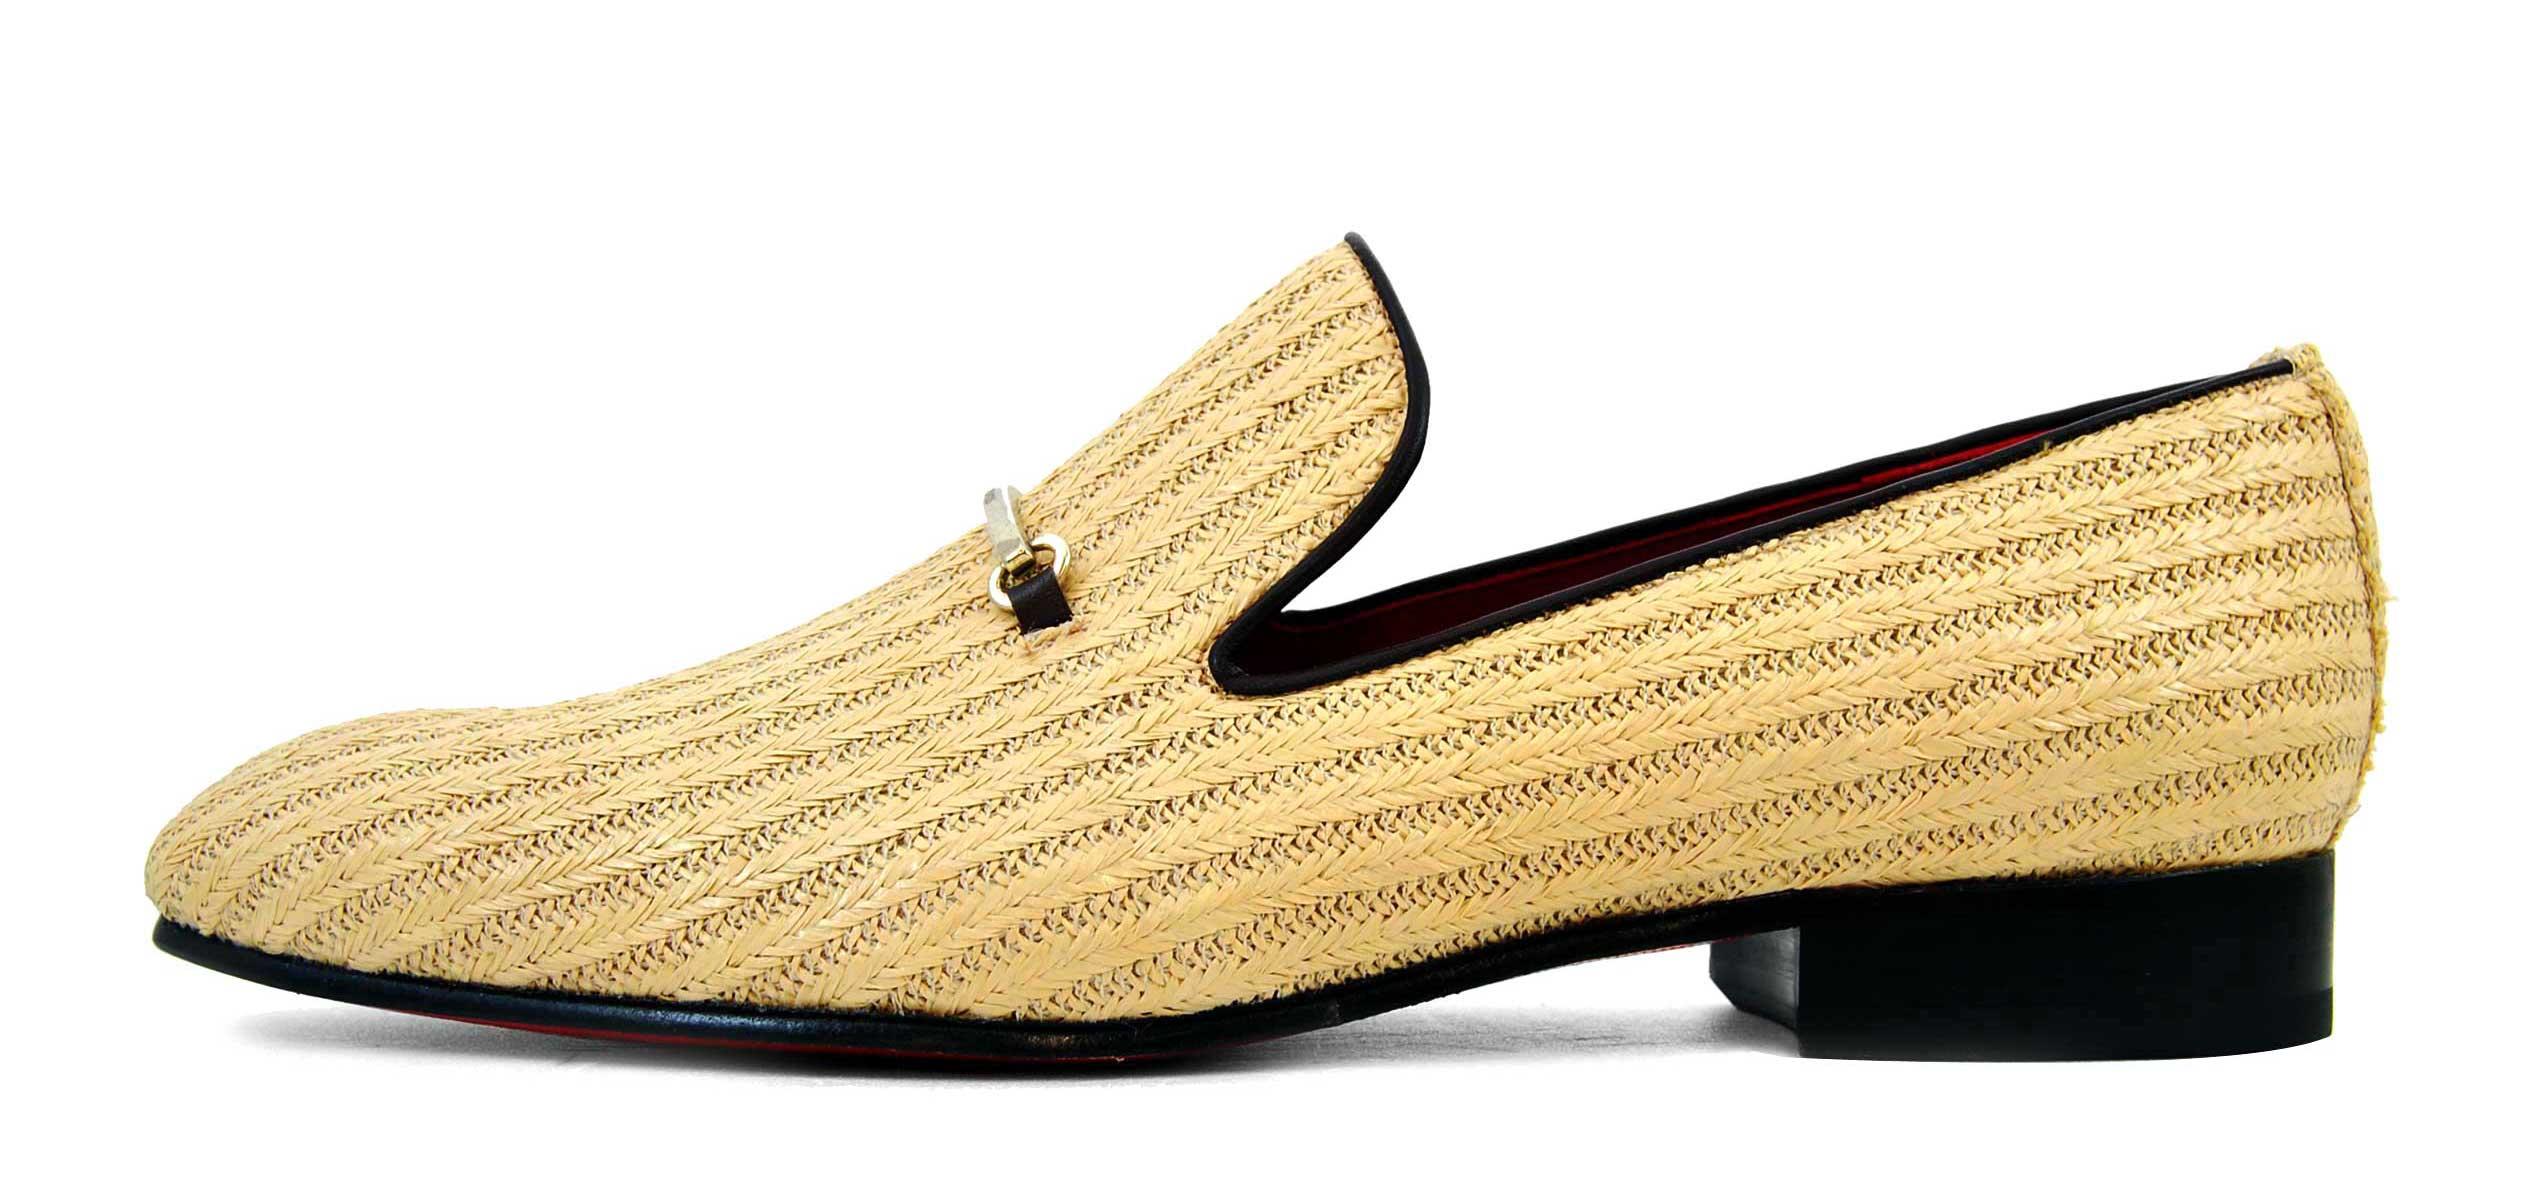 Foto 1 de Zapatos Palma Panameña